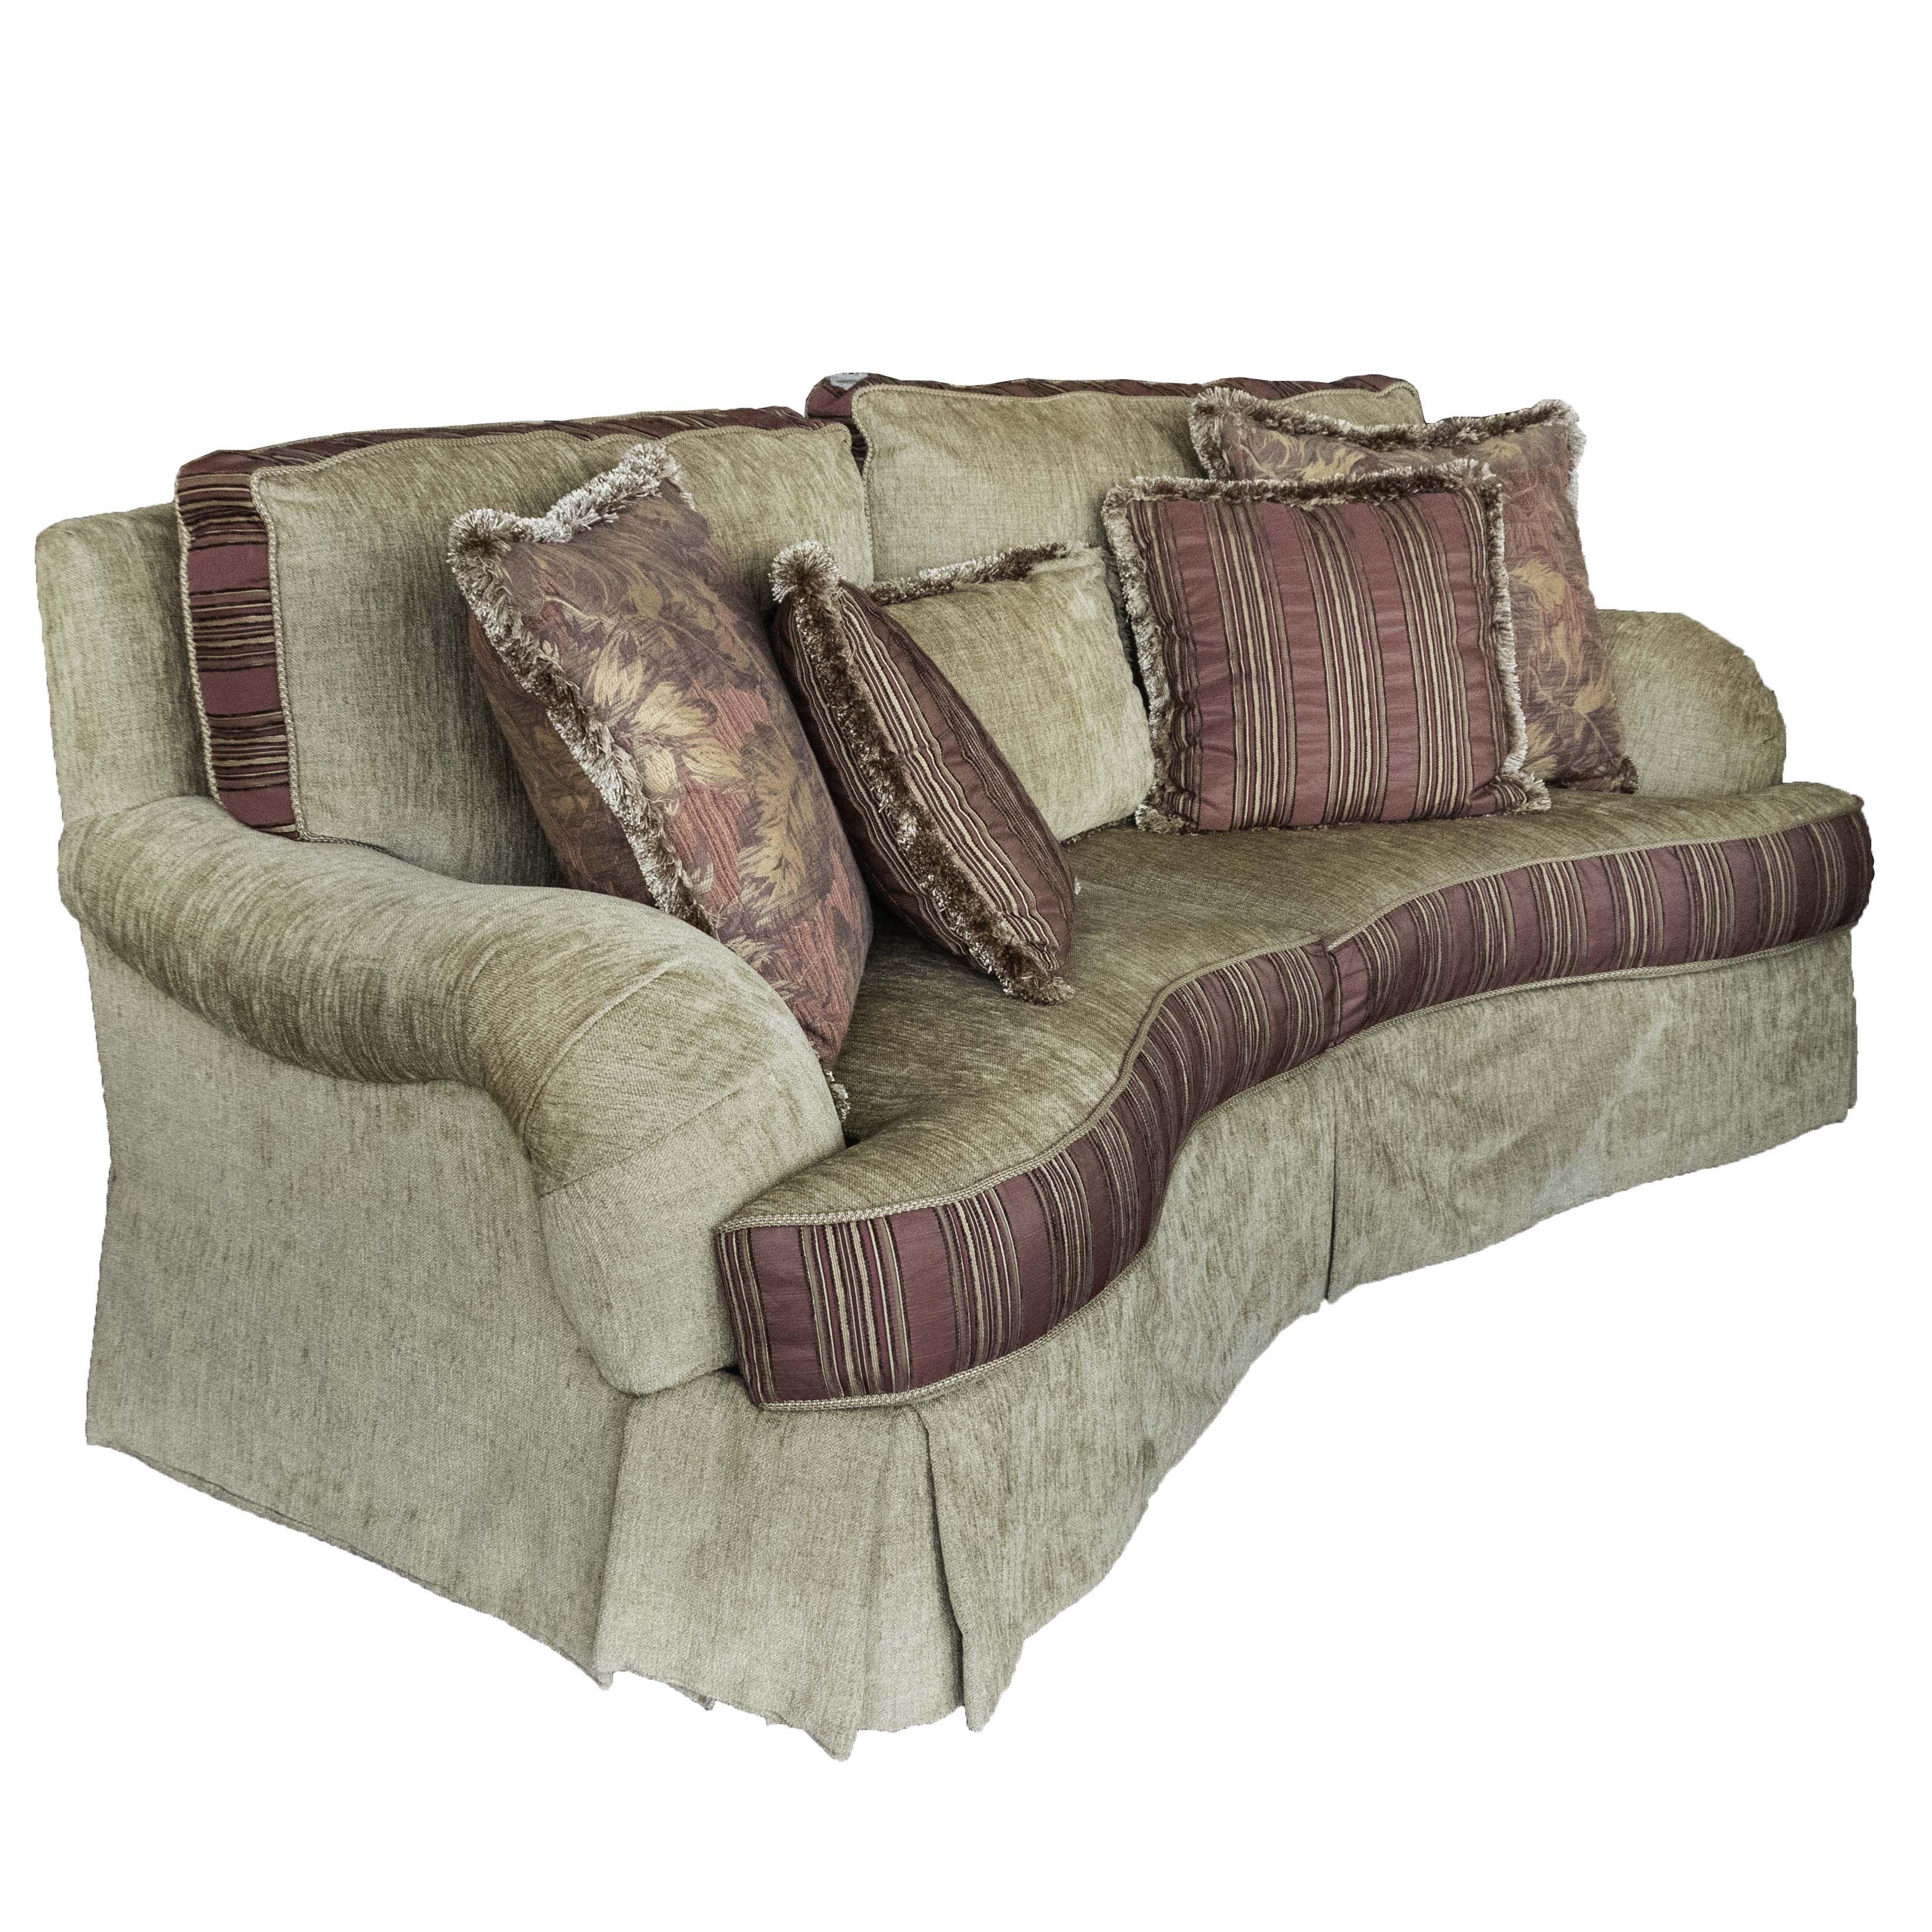 From North Carolina Furniture